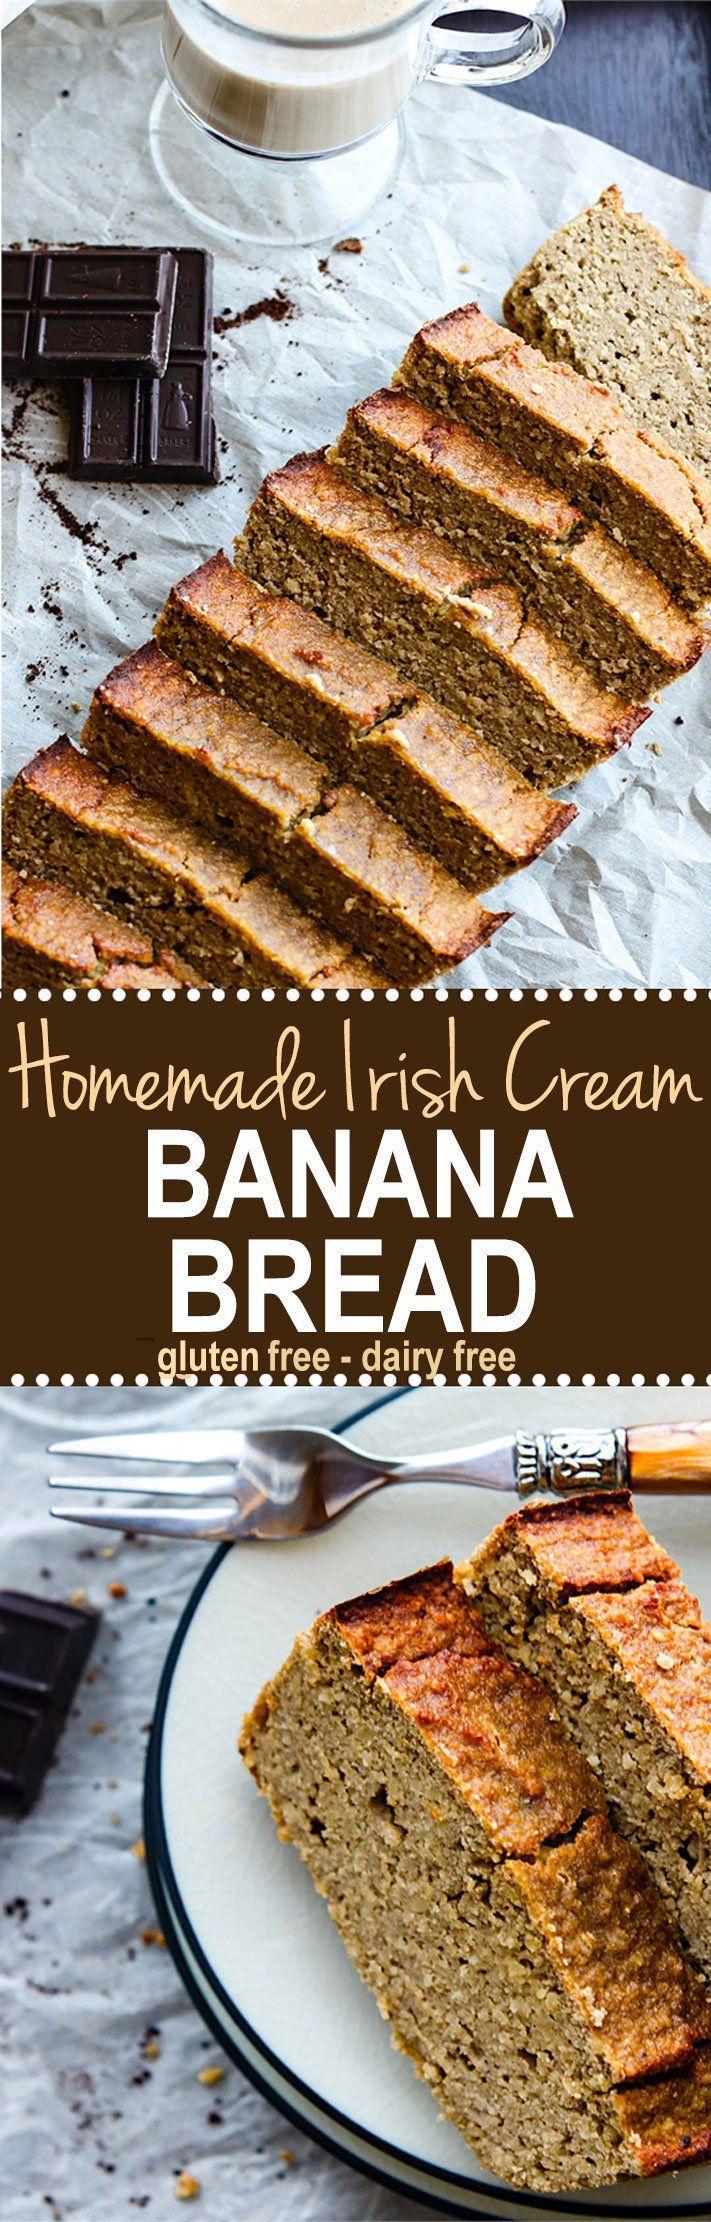 Homemade Irish Cream Gluten Free Banana Bread. Dairy Free Homemade Irish Cream baked right into a super healthy grain free and gluten free banana bread. The perfect IRISH treat for anytime! Make and enjoy for breakfast, snacking, or dessert! Paleo friendly version as well.